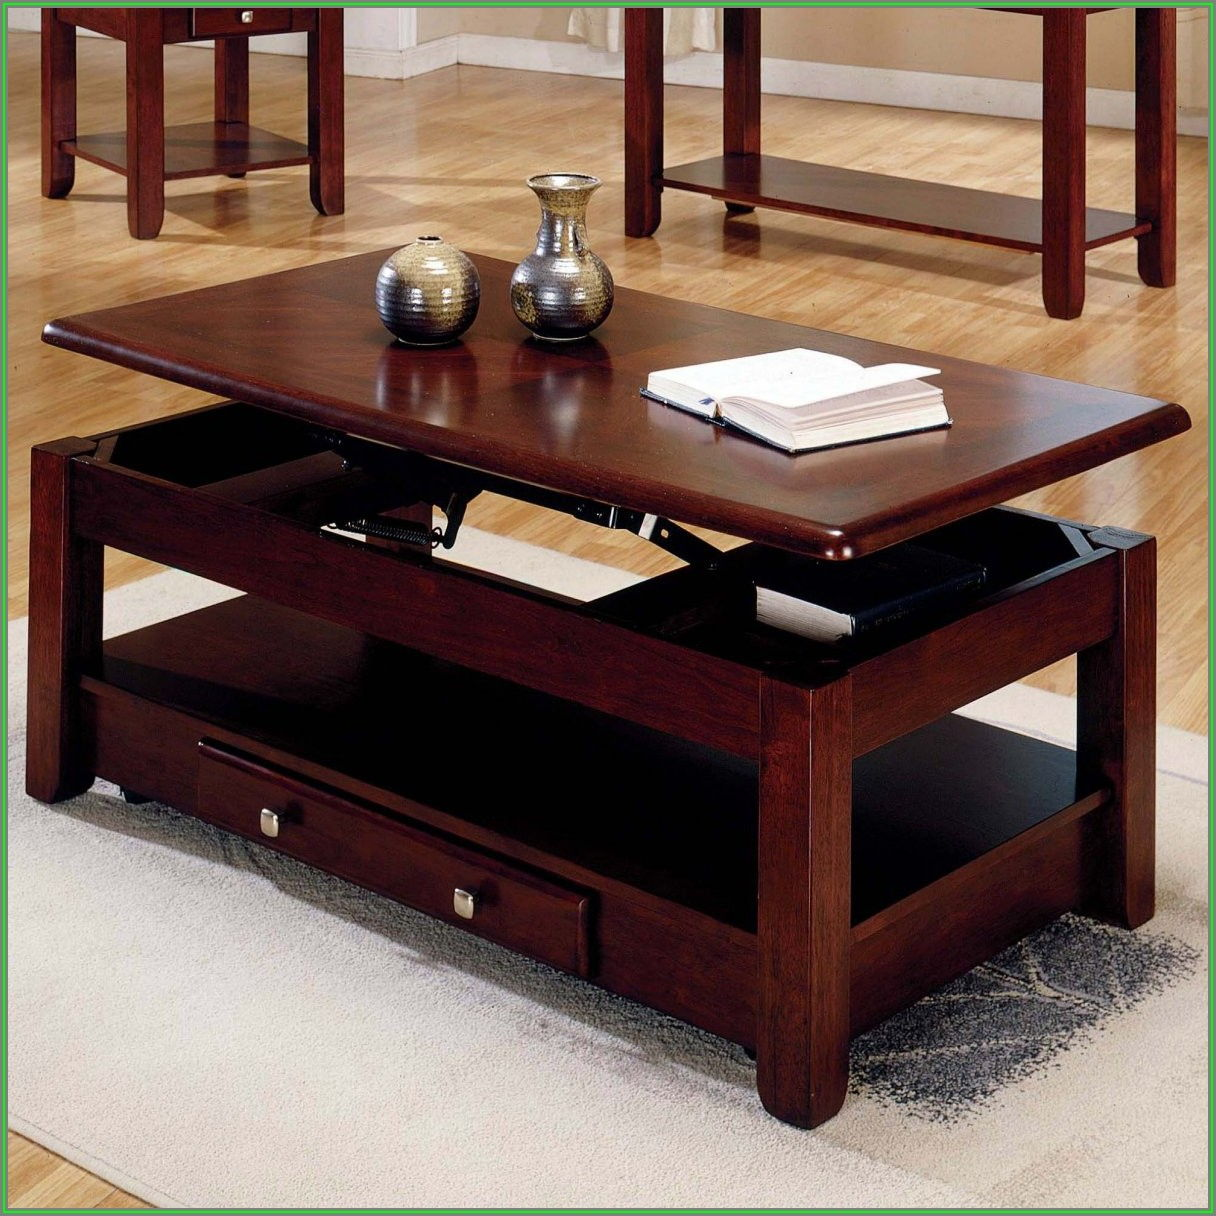 Lift Top Coffee Table Ikea